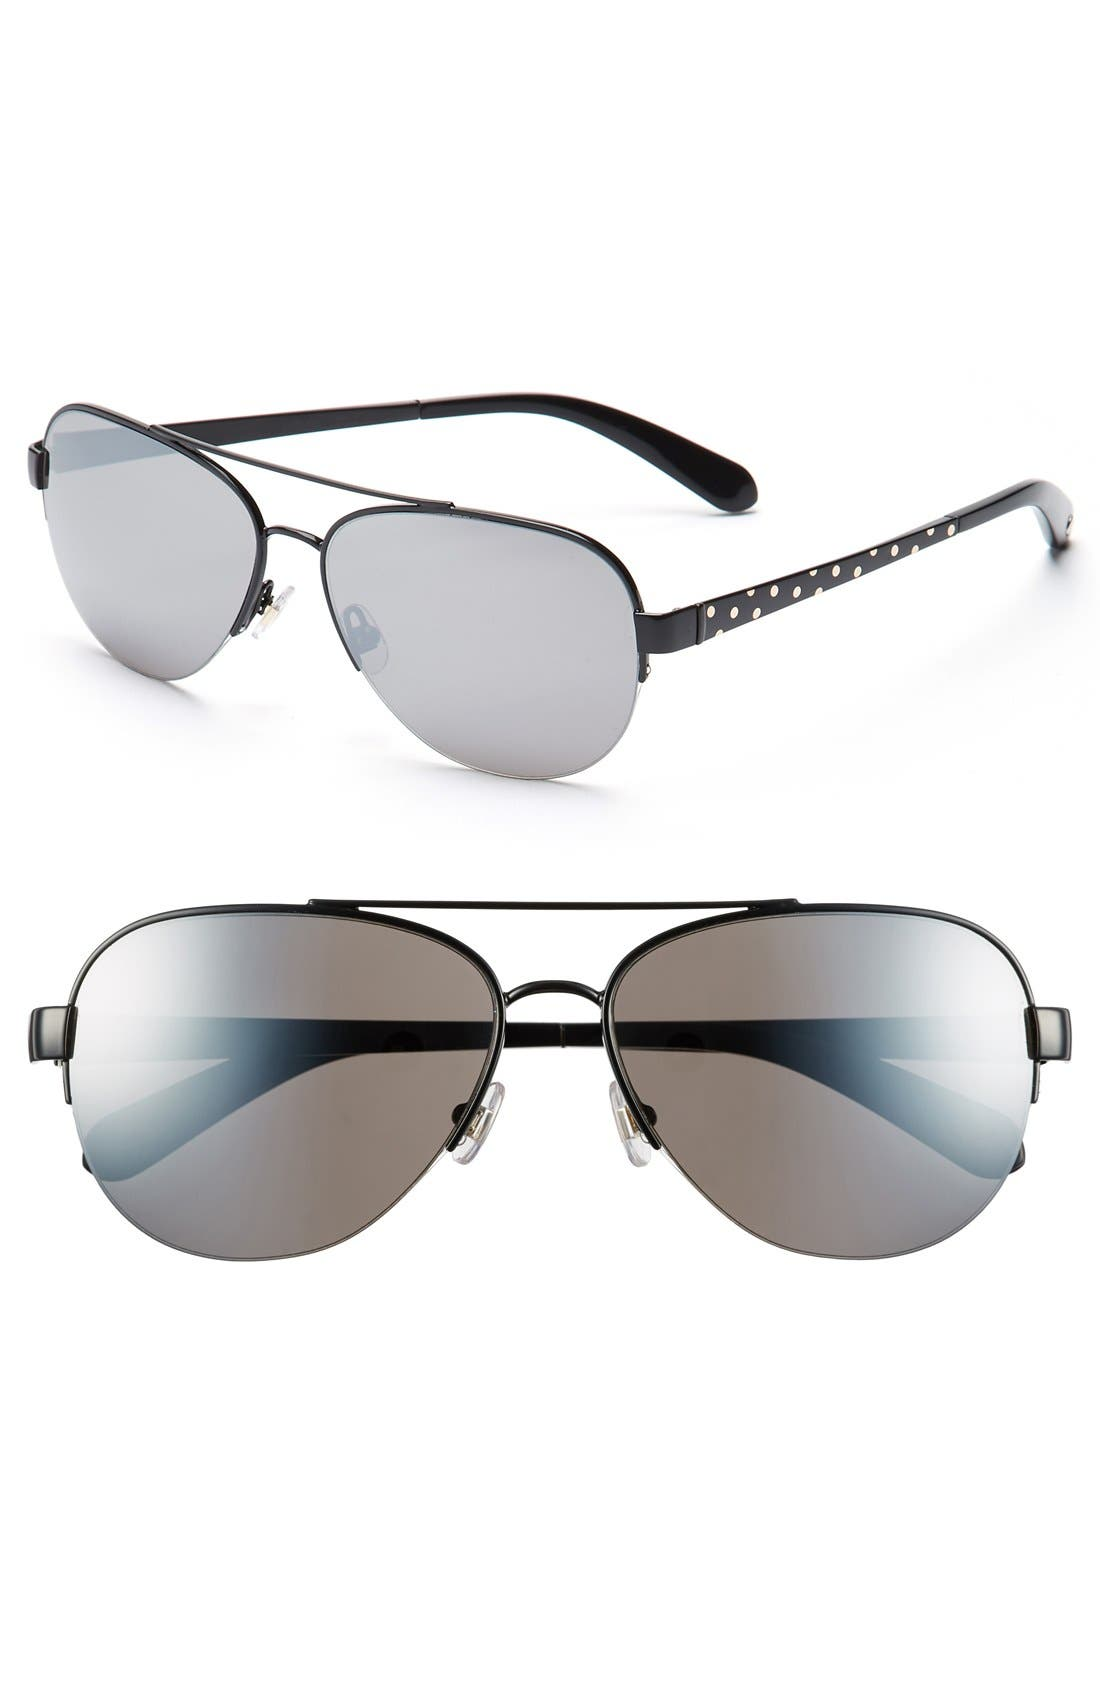 57mm aviator sunglasses,                             Main thumbnail 1, color,                             001